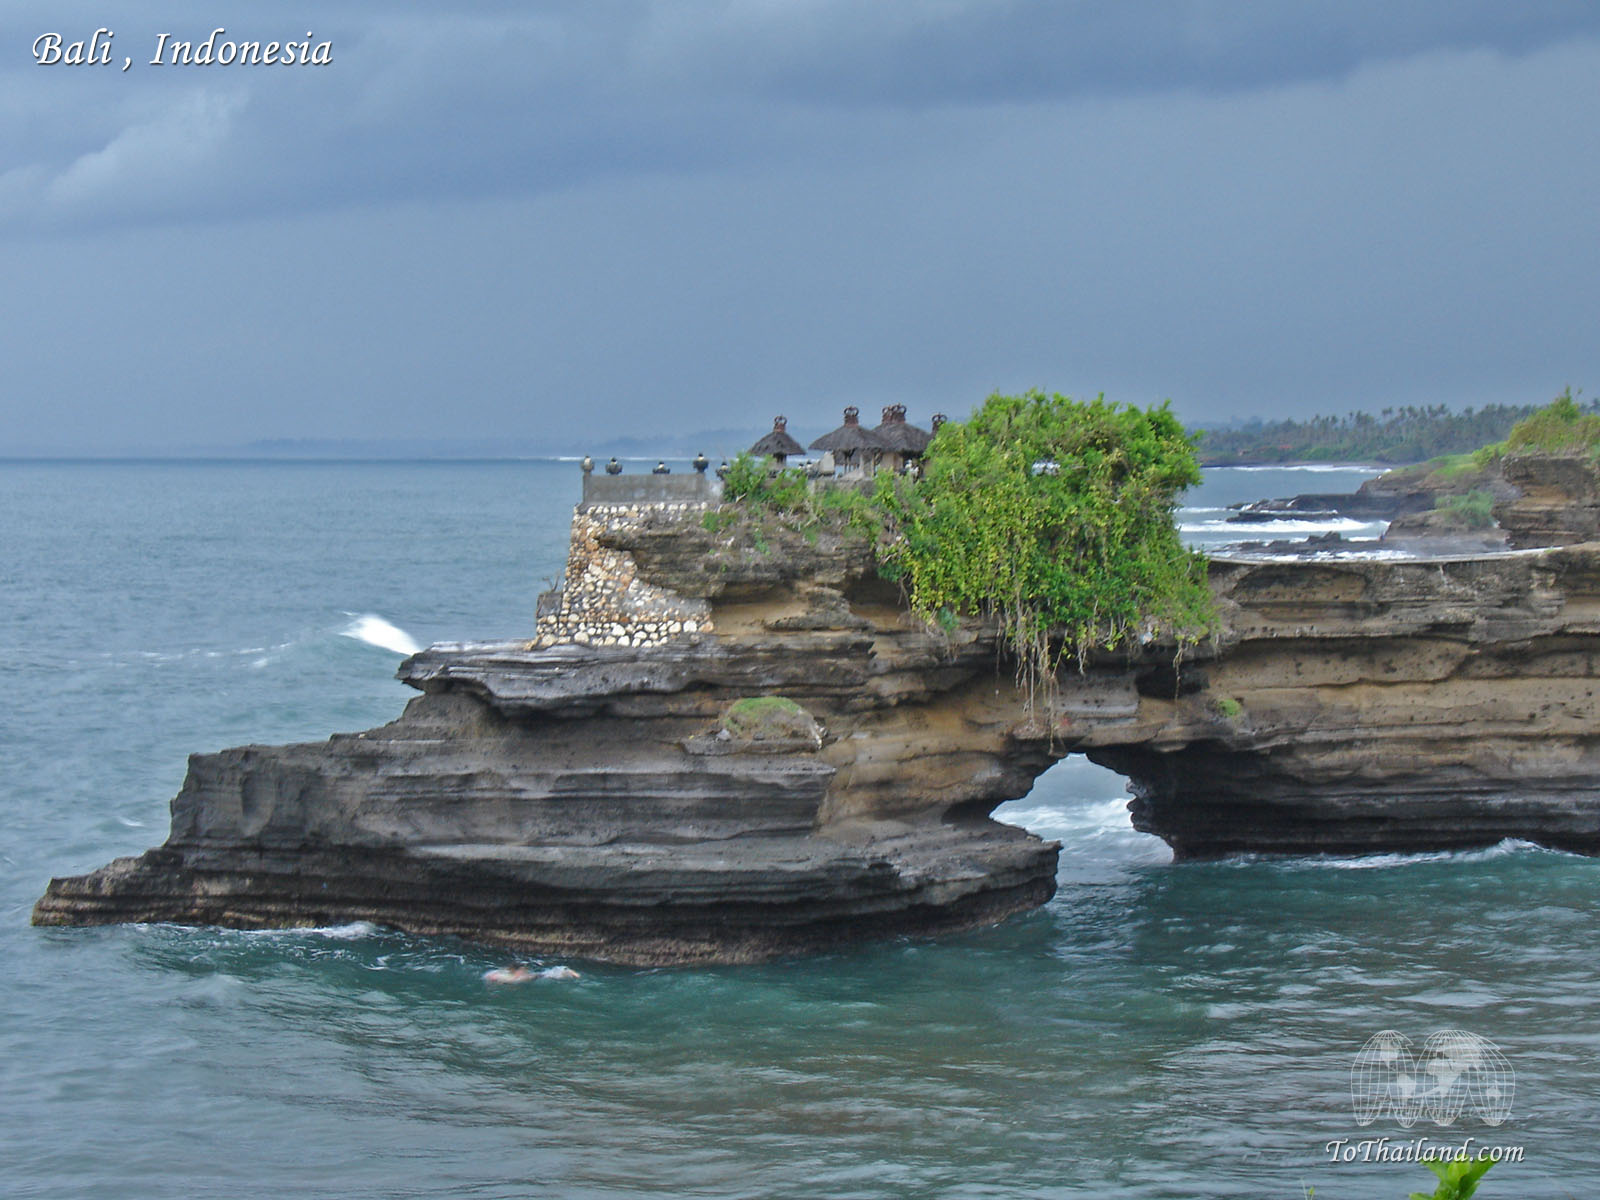 Bali Bali_tanahlot